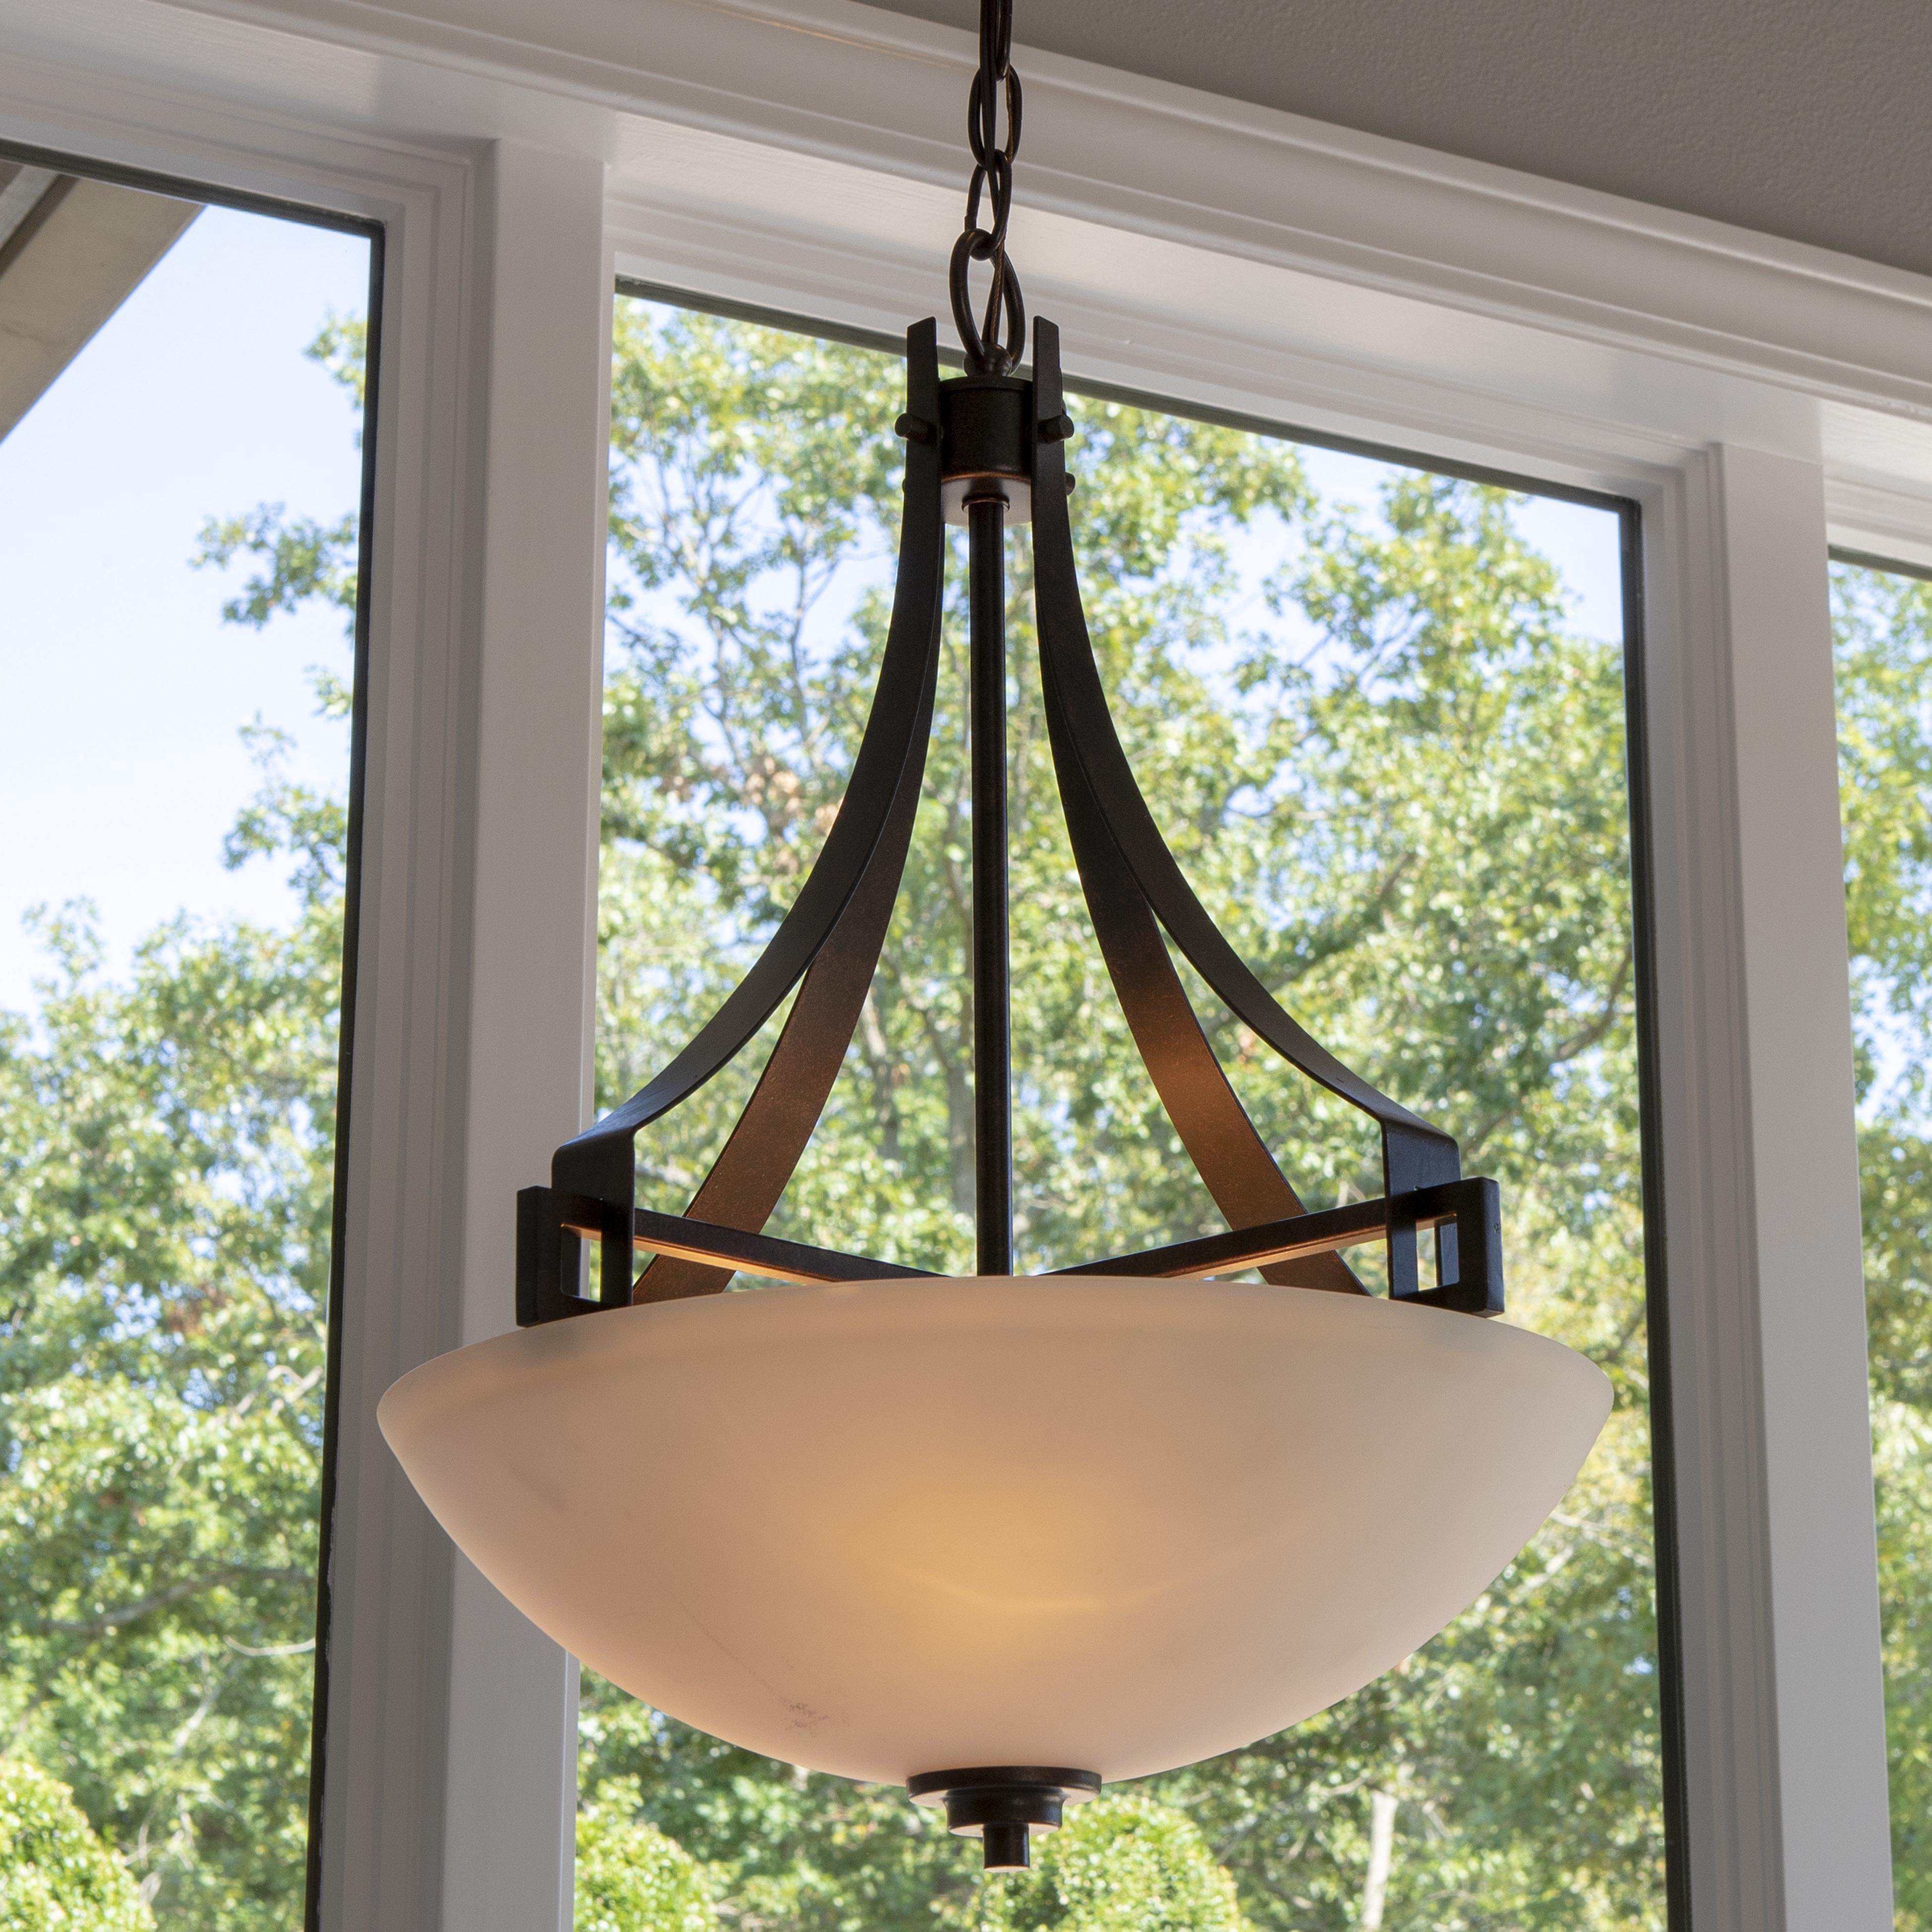 Latest Felica 1 Light Single Bowl Pendant Pertaining To Newent 3 Light Single Bowl Pendants (View 10 of 25)